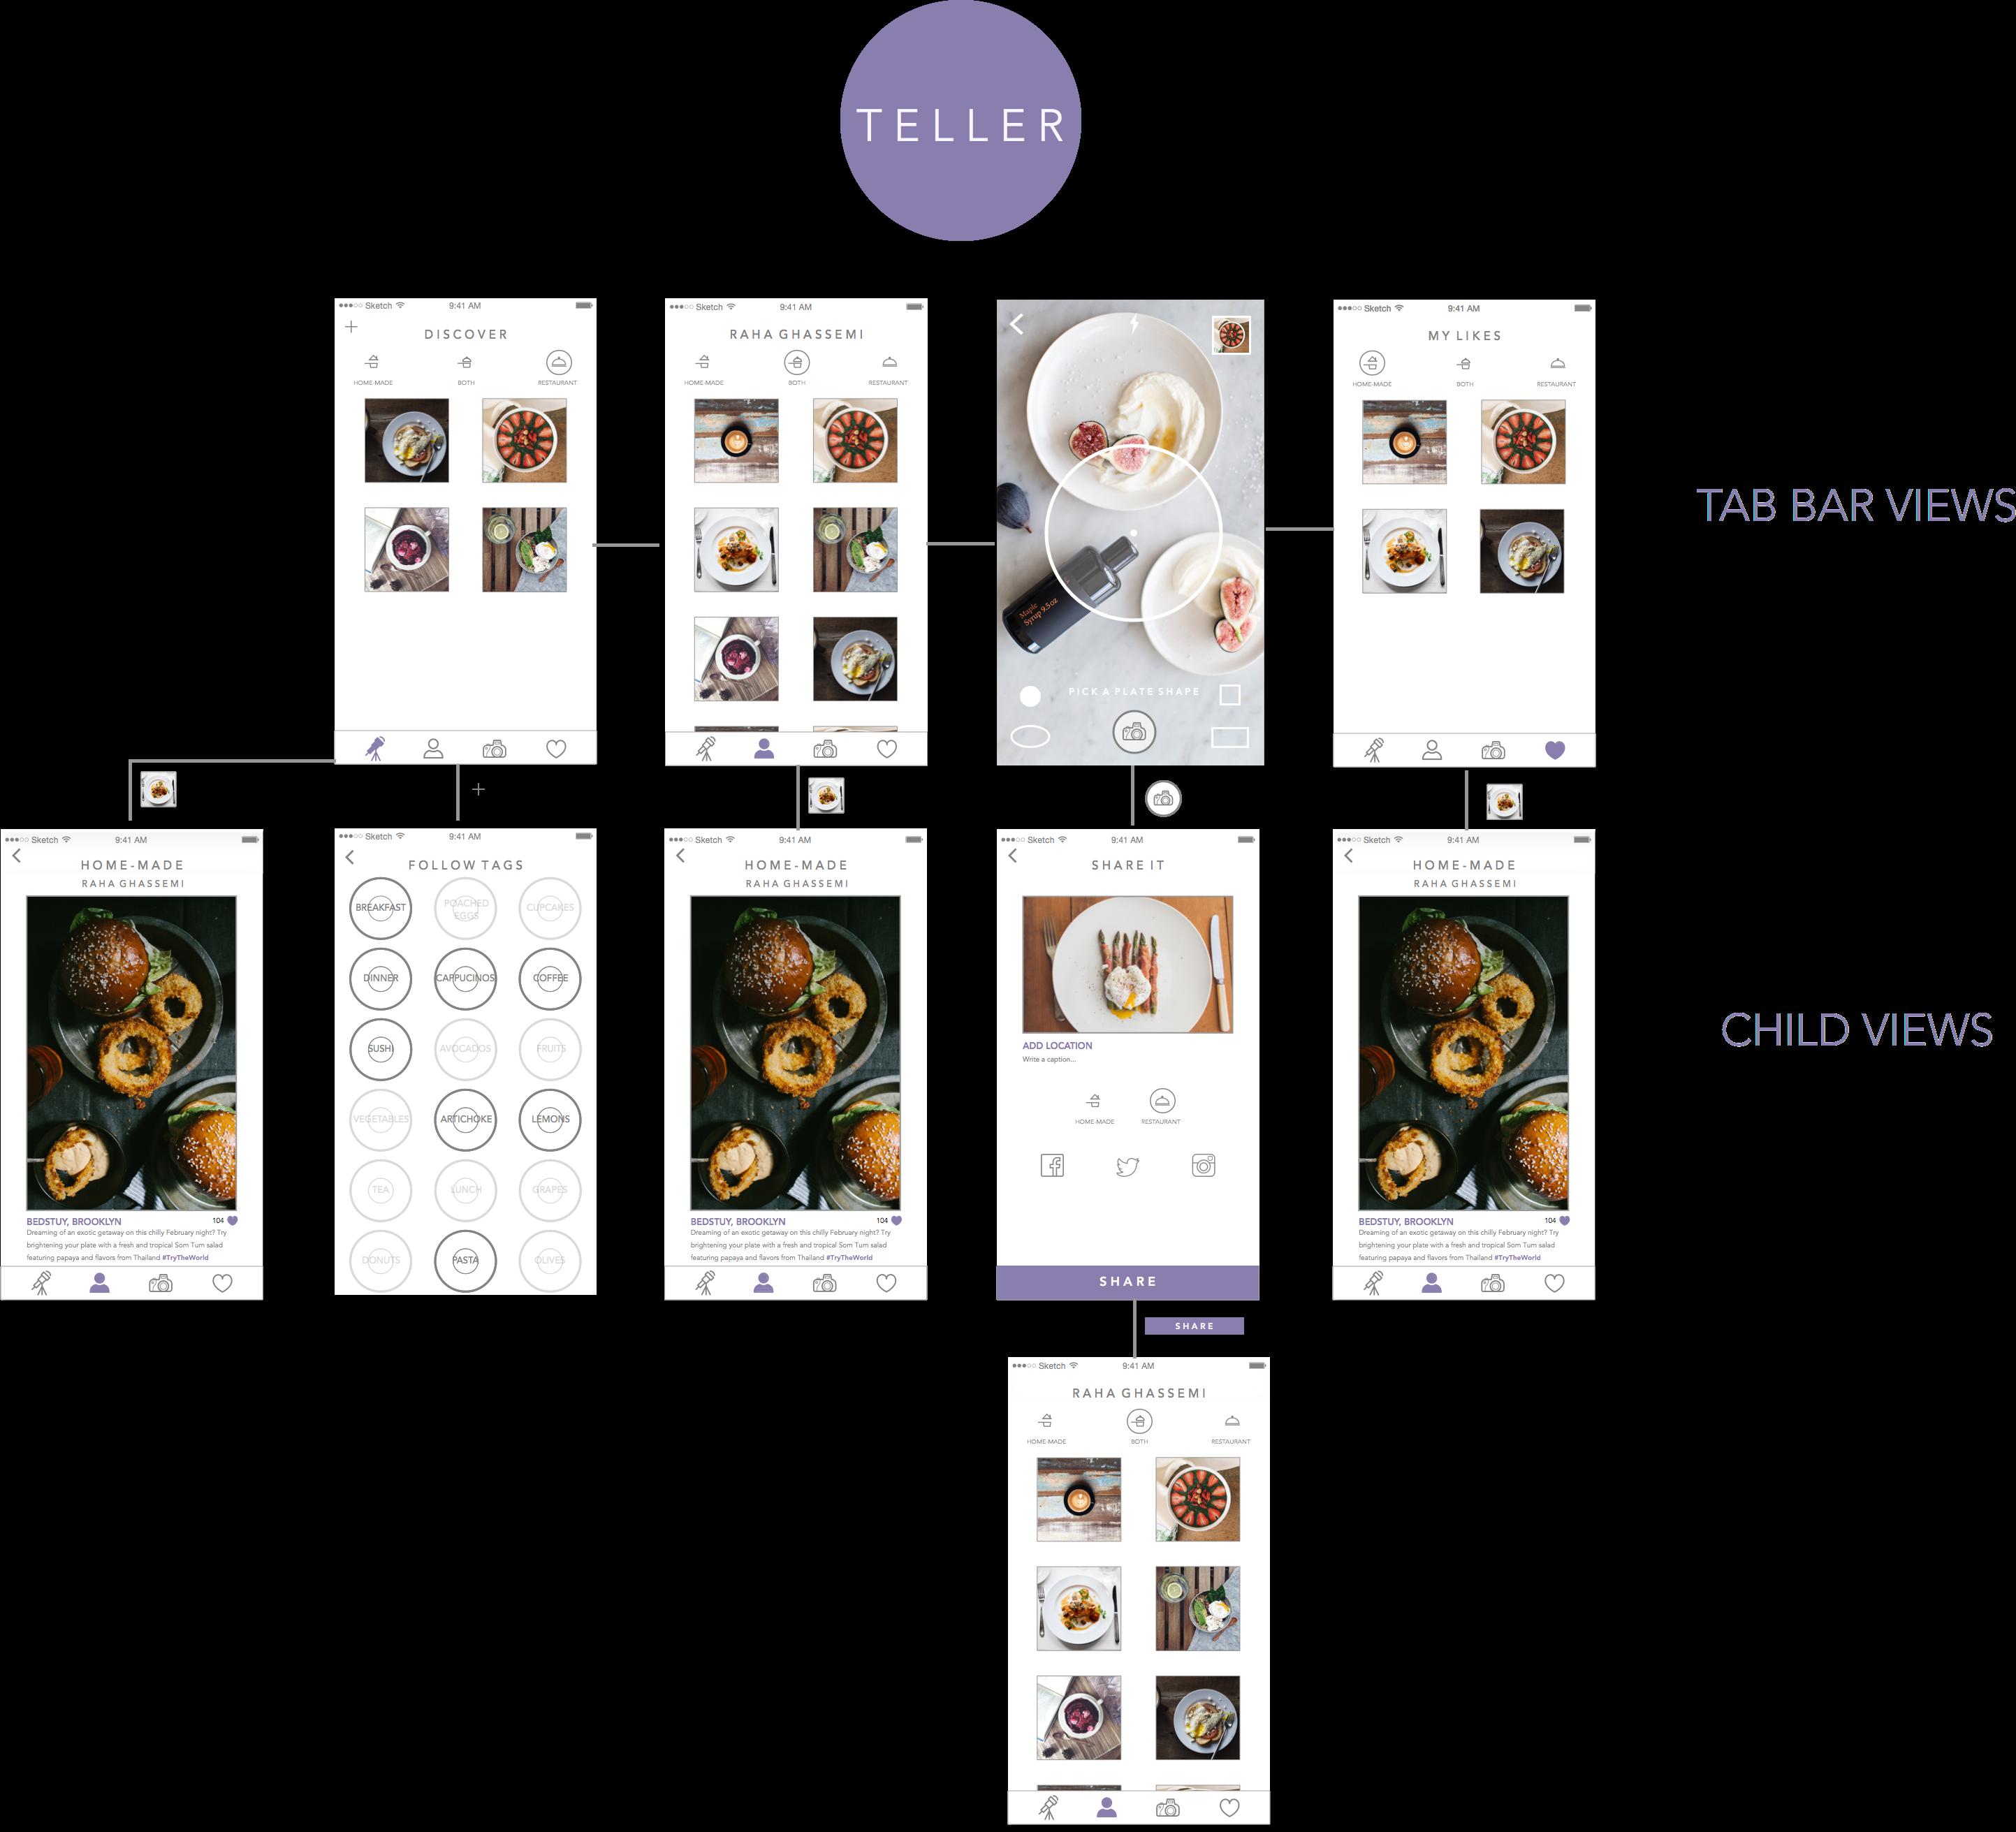 Teller Prototype 2 New Navigation Organization App Mapp Invision App Mobile Media